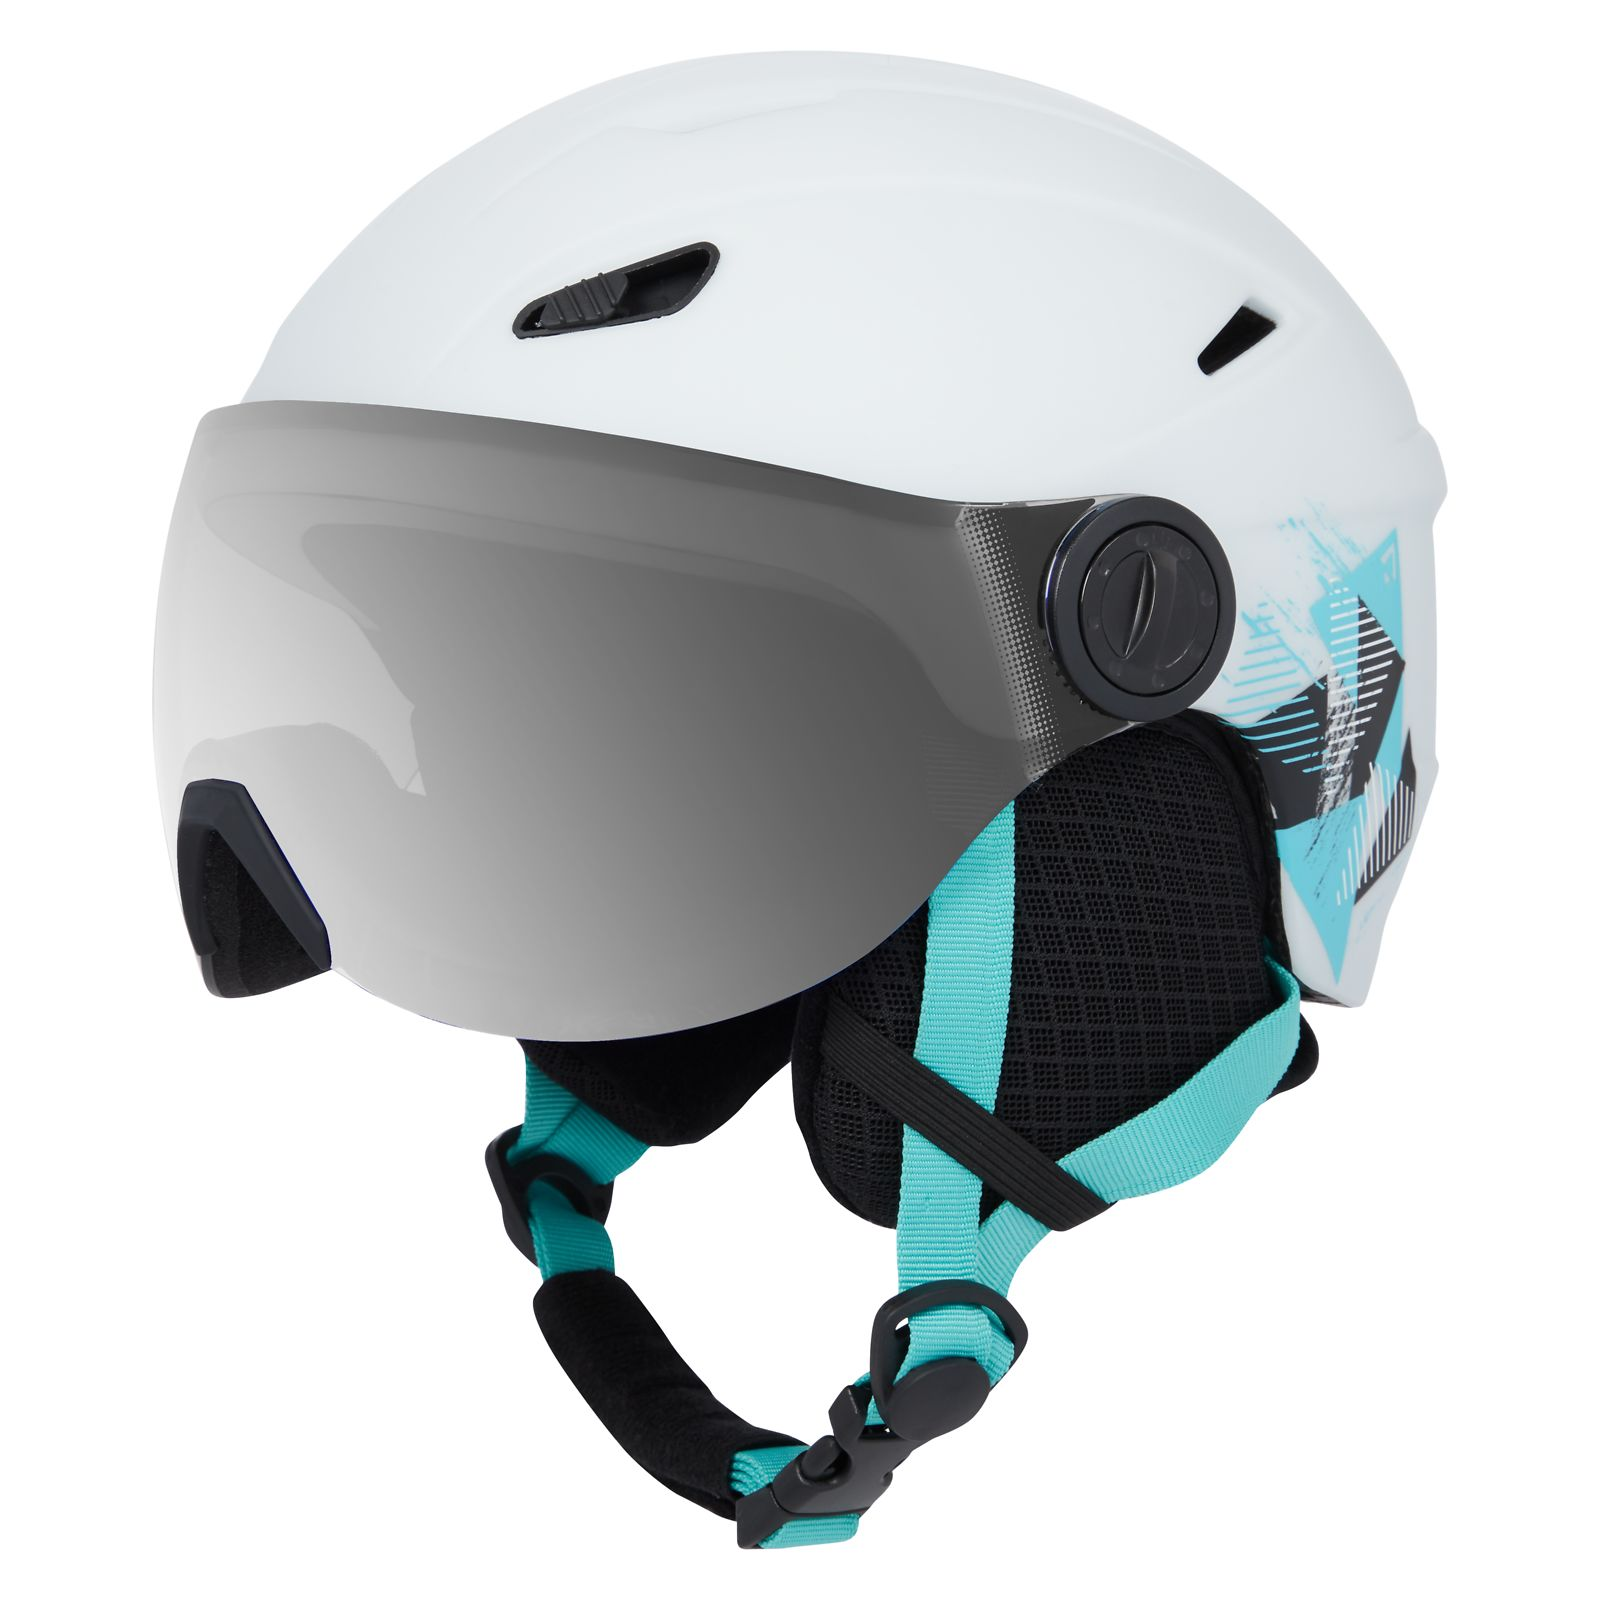 Kask narciarski dla dzieci TecnoPro Pulse Visor S2 HS-016 282381